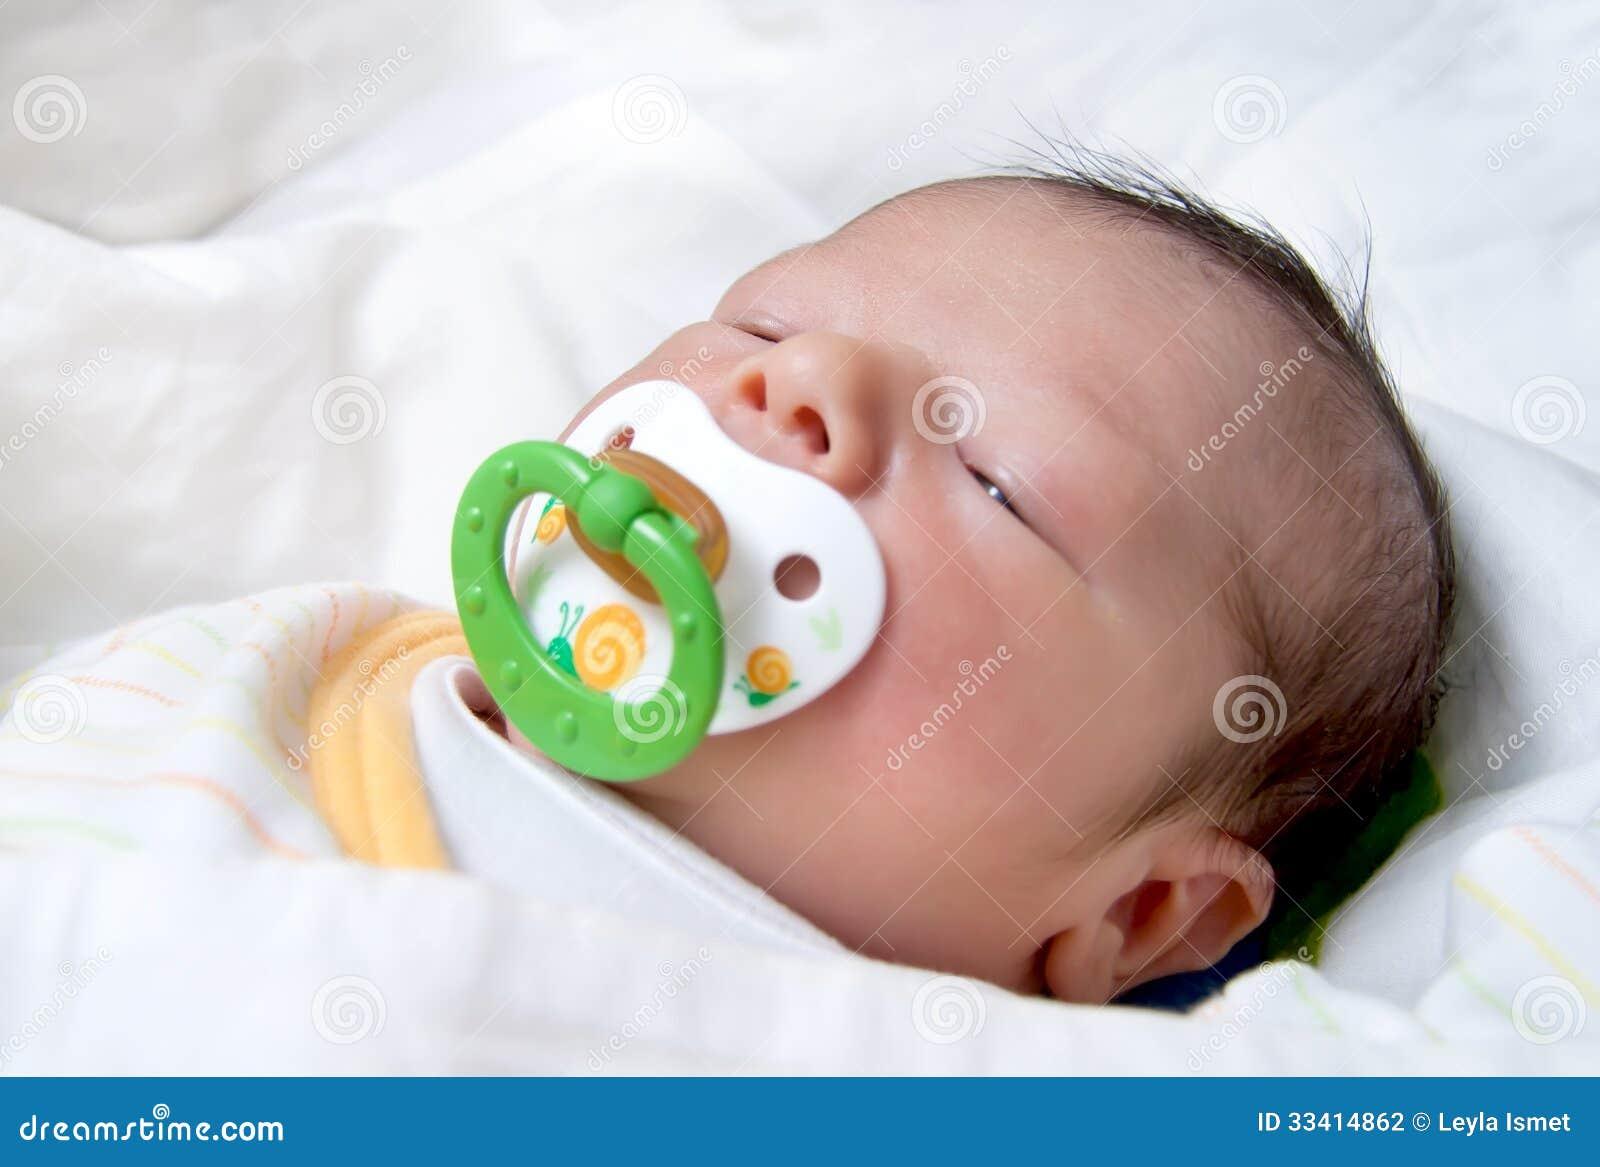 Newborn Baby With Pacifier Sleeping Stock Photo Image